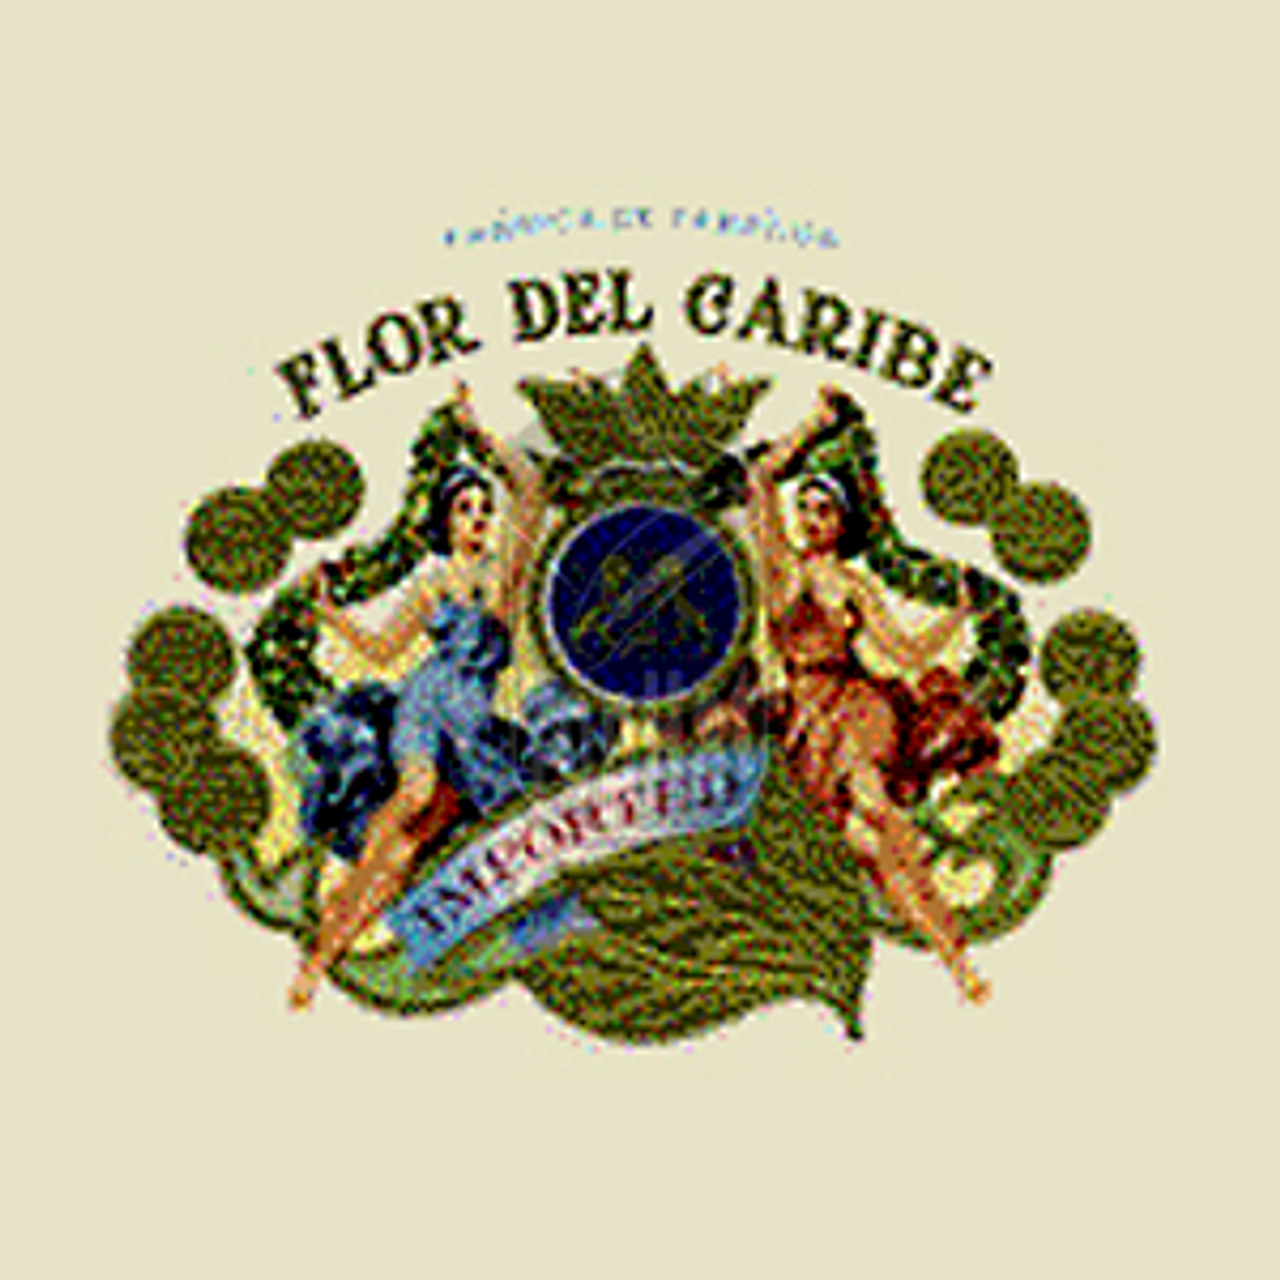 Flor Del Caribe St. Thomas Pyramid Maduro Cigars - 6 x 54 (Box of 20)